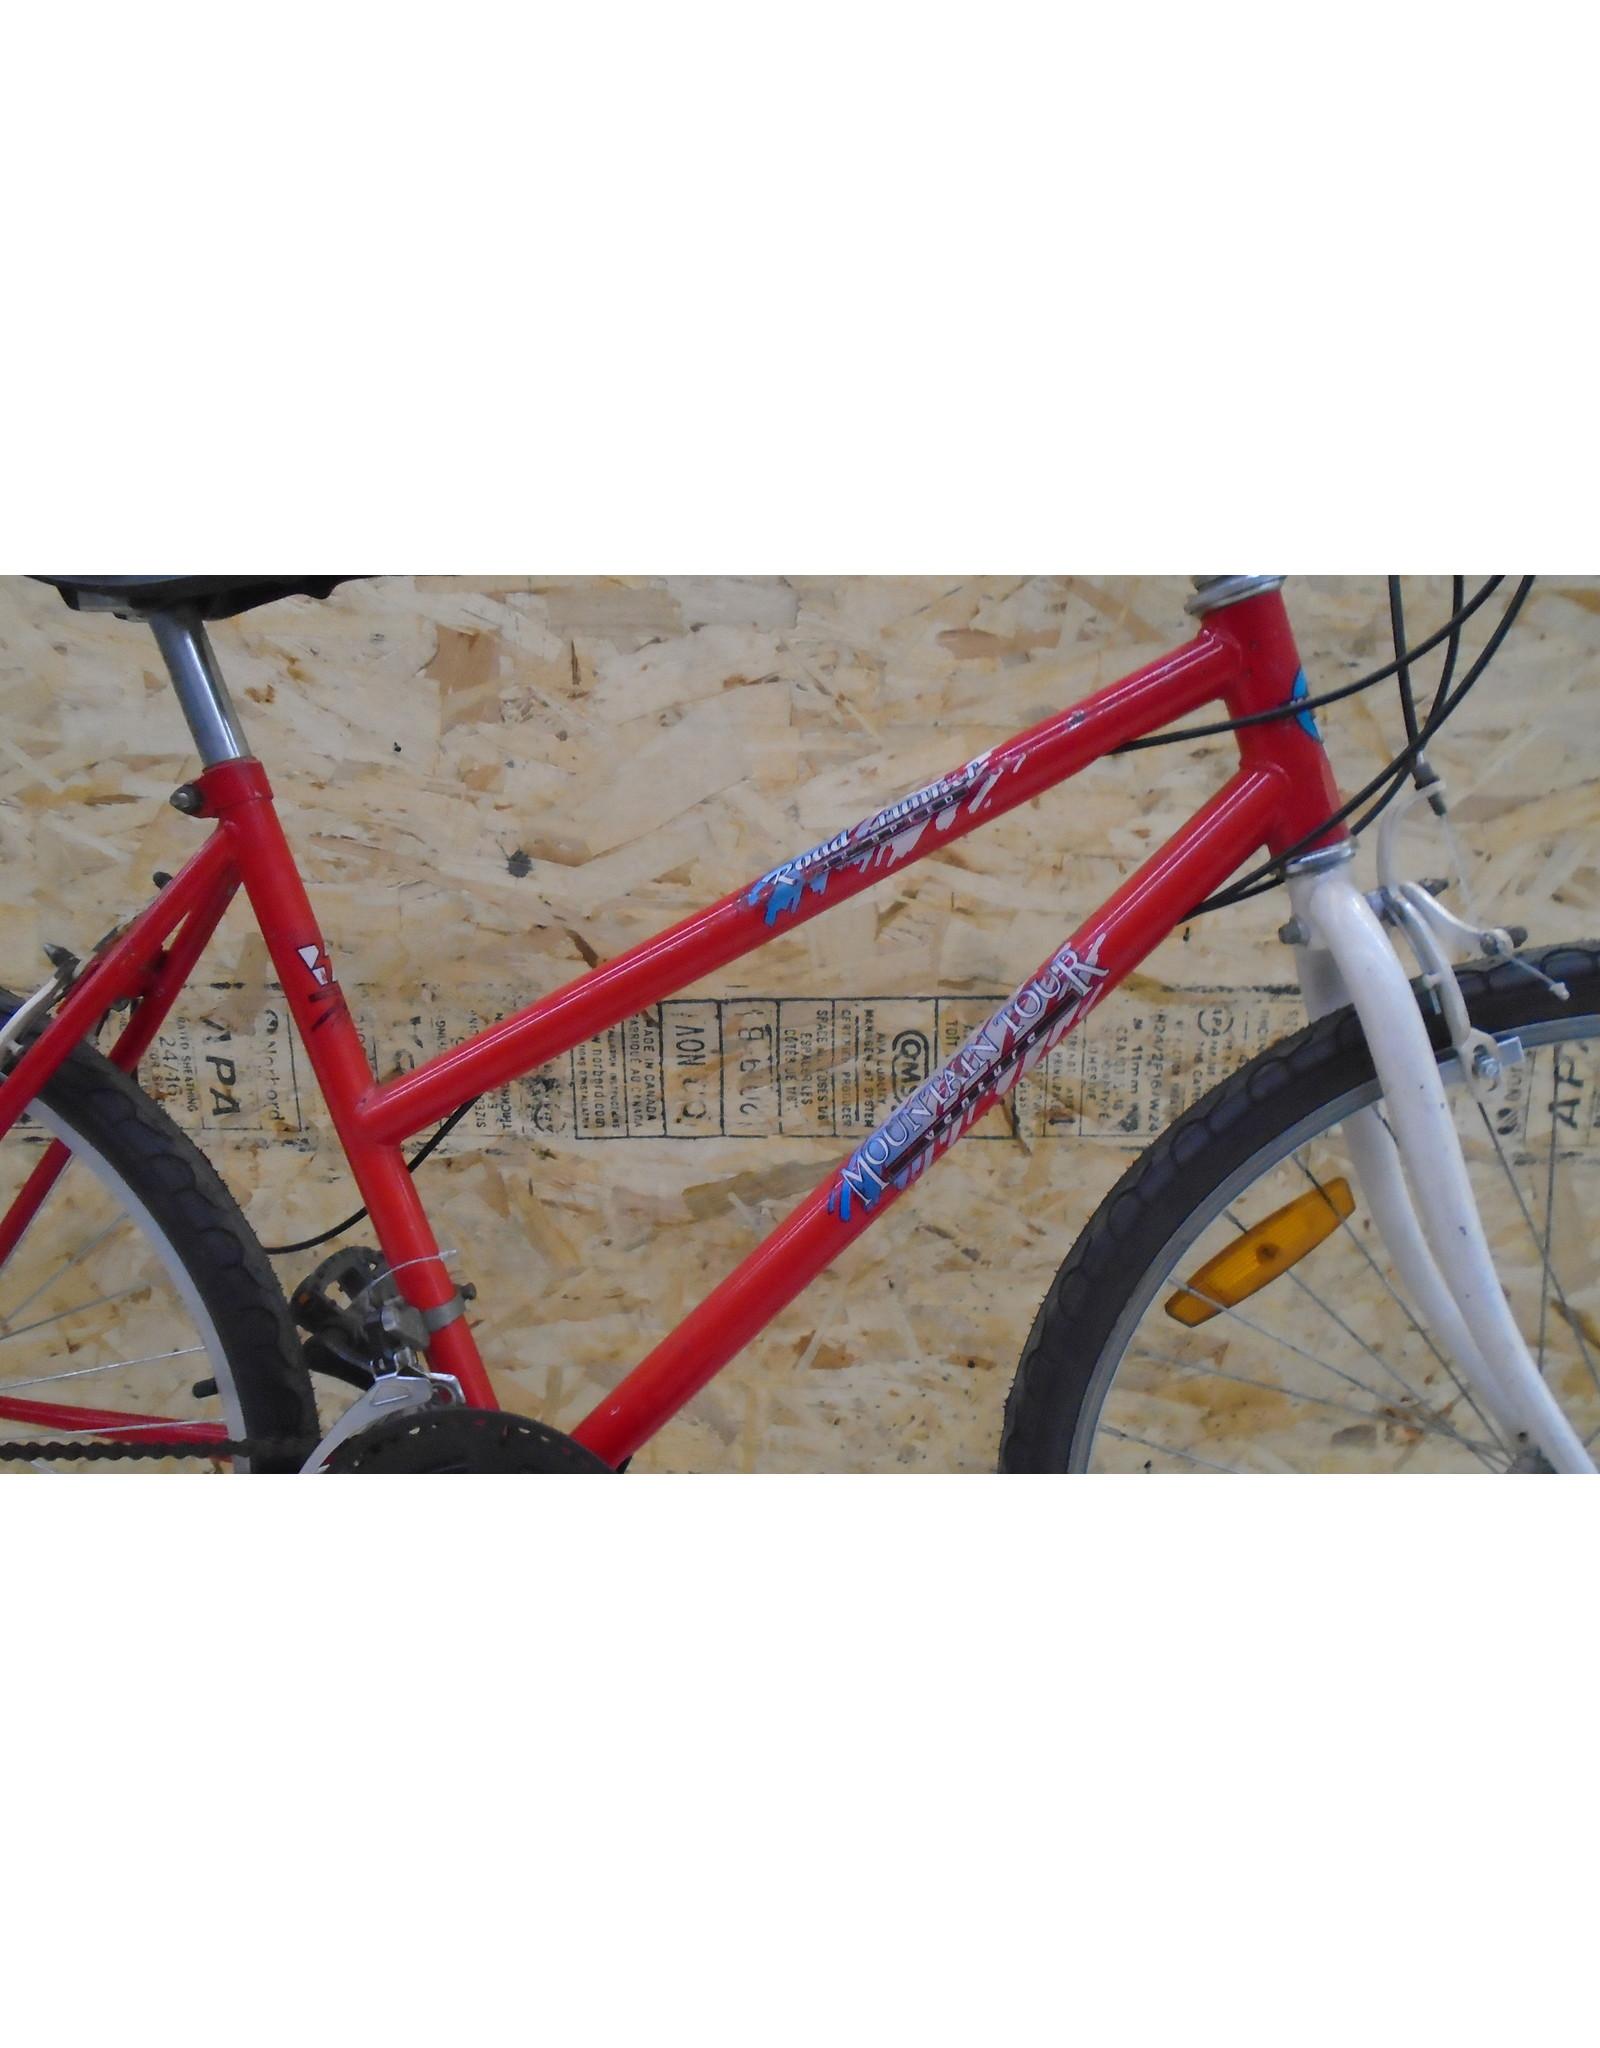 "Vélo usagé de ville Mountain tour 19"" - 7778"